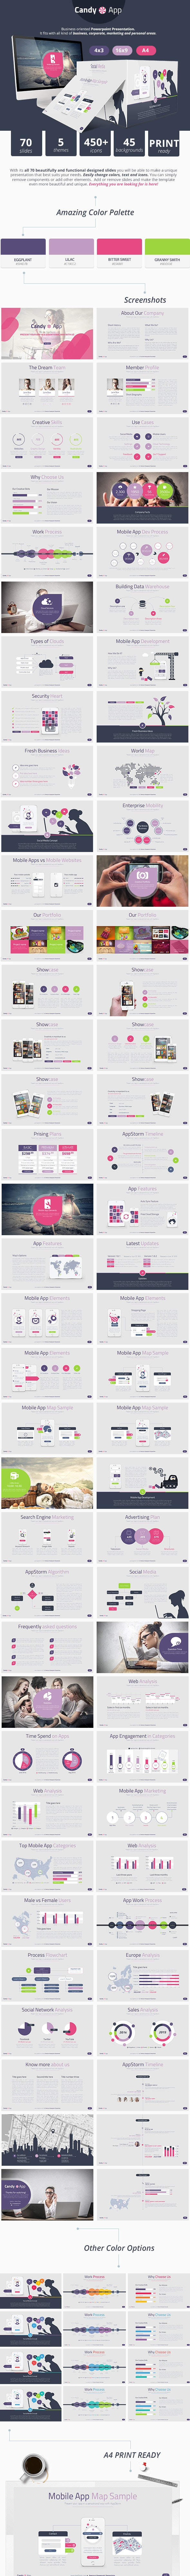 CandyApp Powerpoint Presentation - Creative PowerPoint Templates